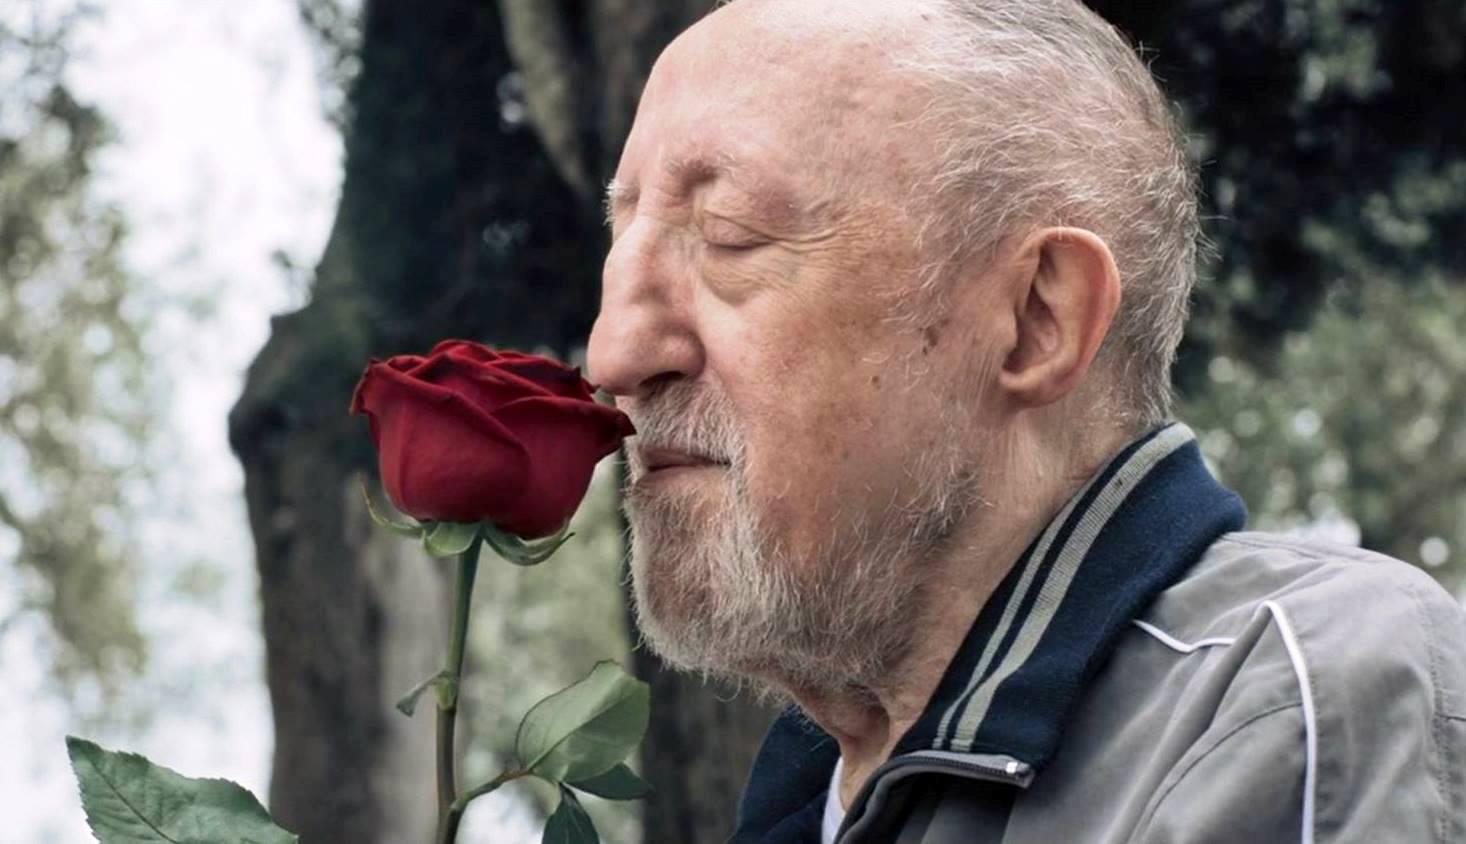 Chi salverà le rose